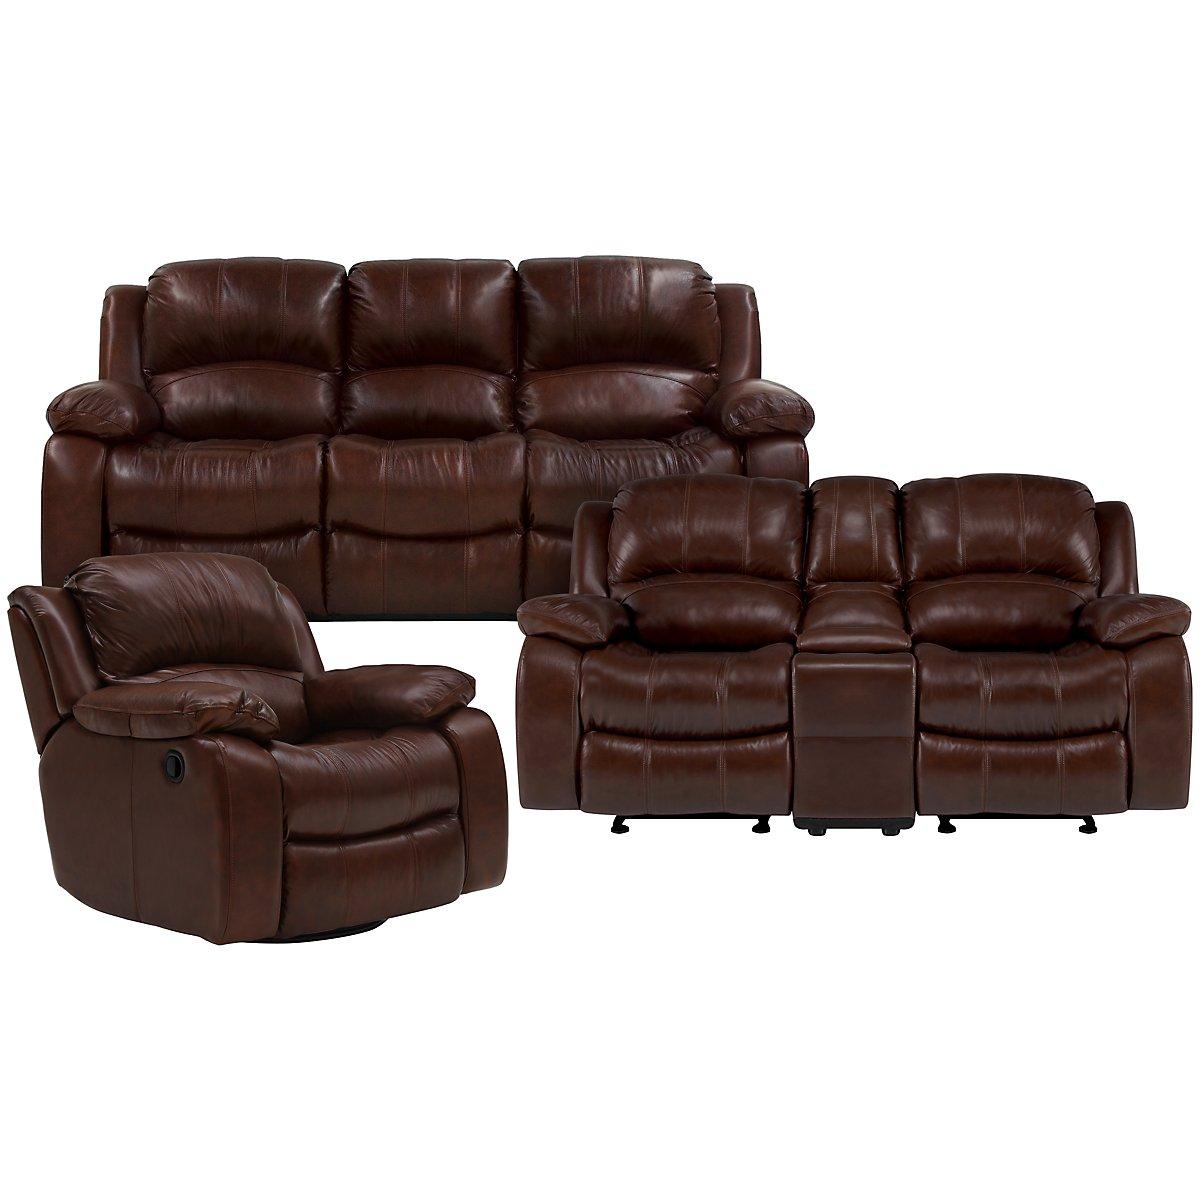 Tyler3 Medium Brown Leather & Vinyl Power Reclining Living Room